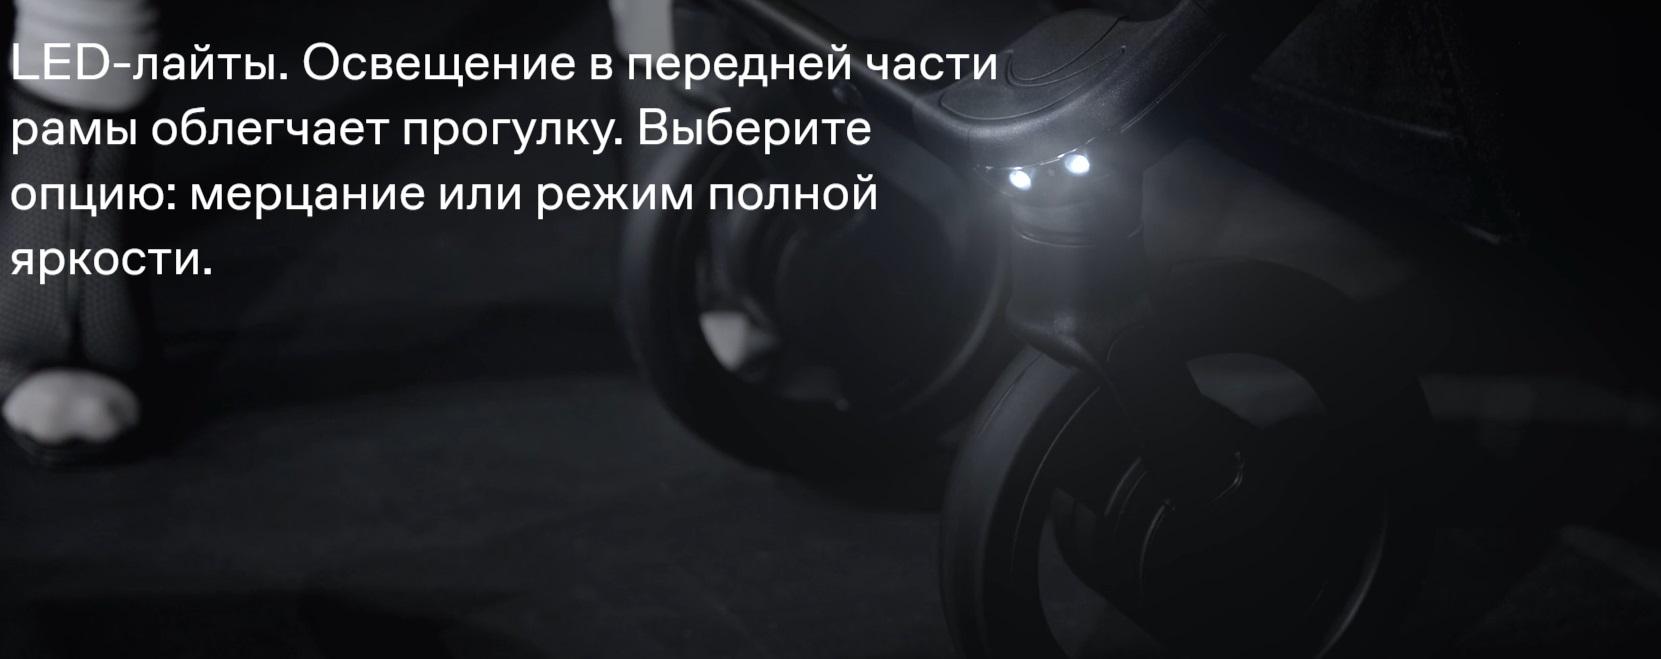 Анекс Квант